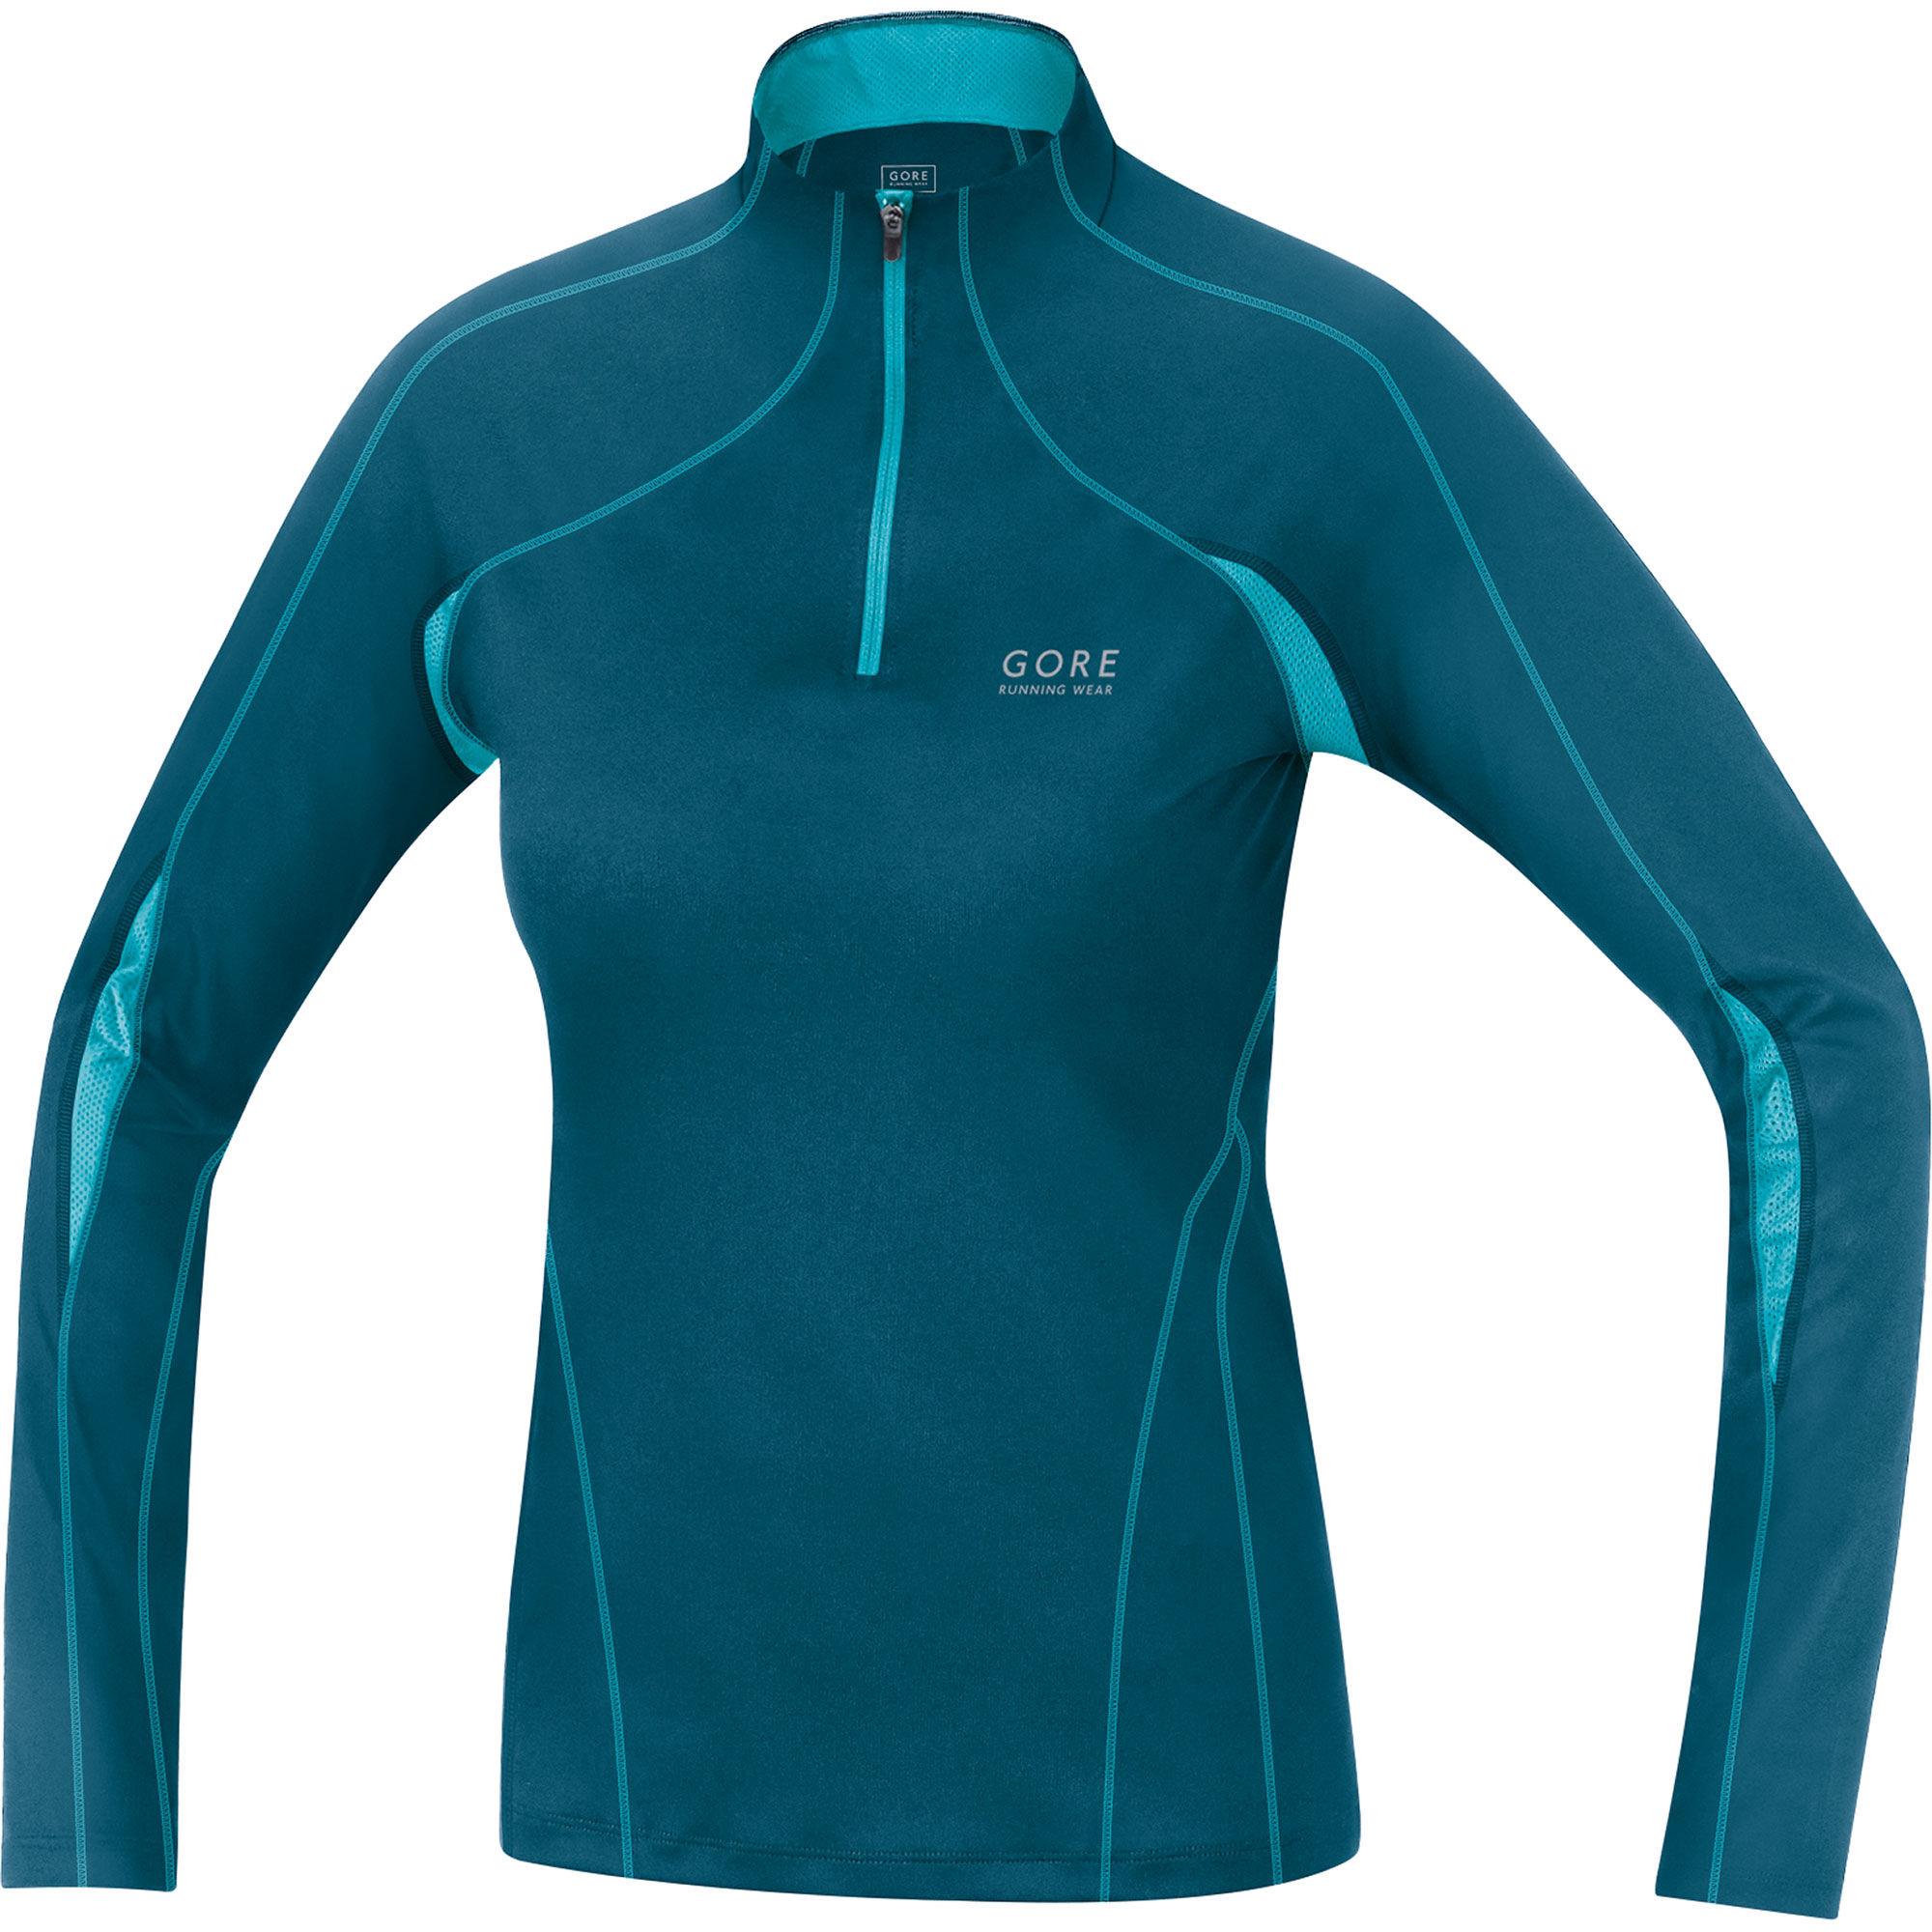 Gore Essential Lady 2.0 Shirt lang in Blau